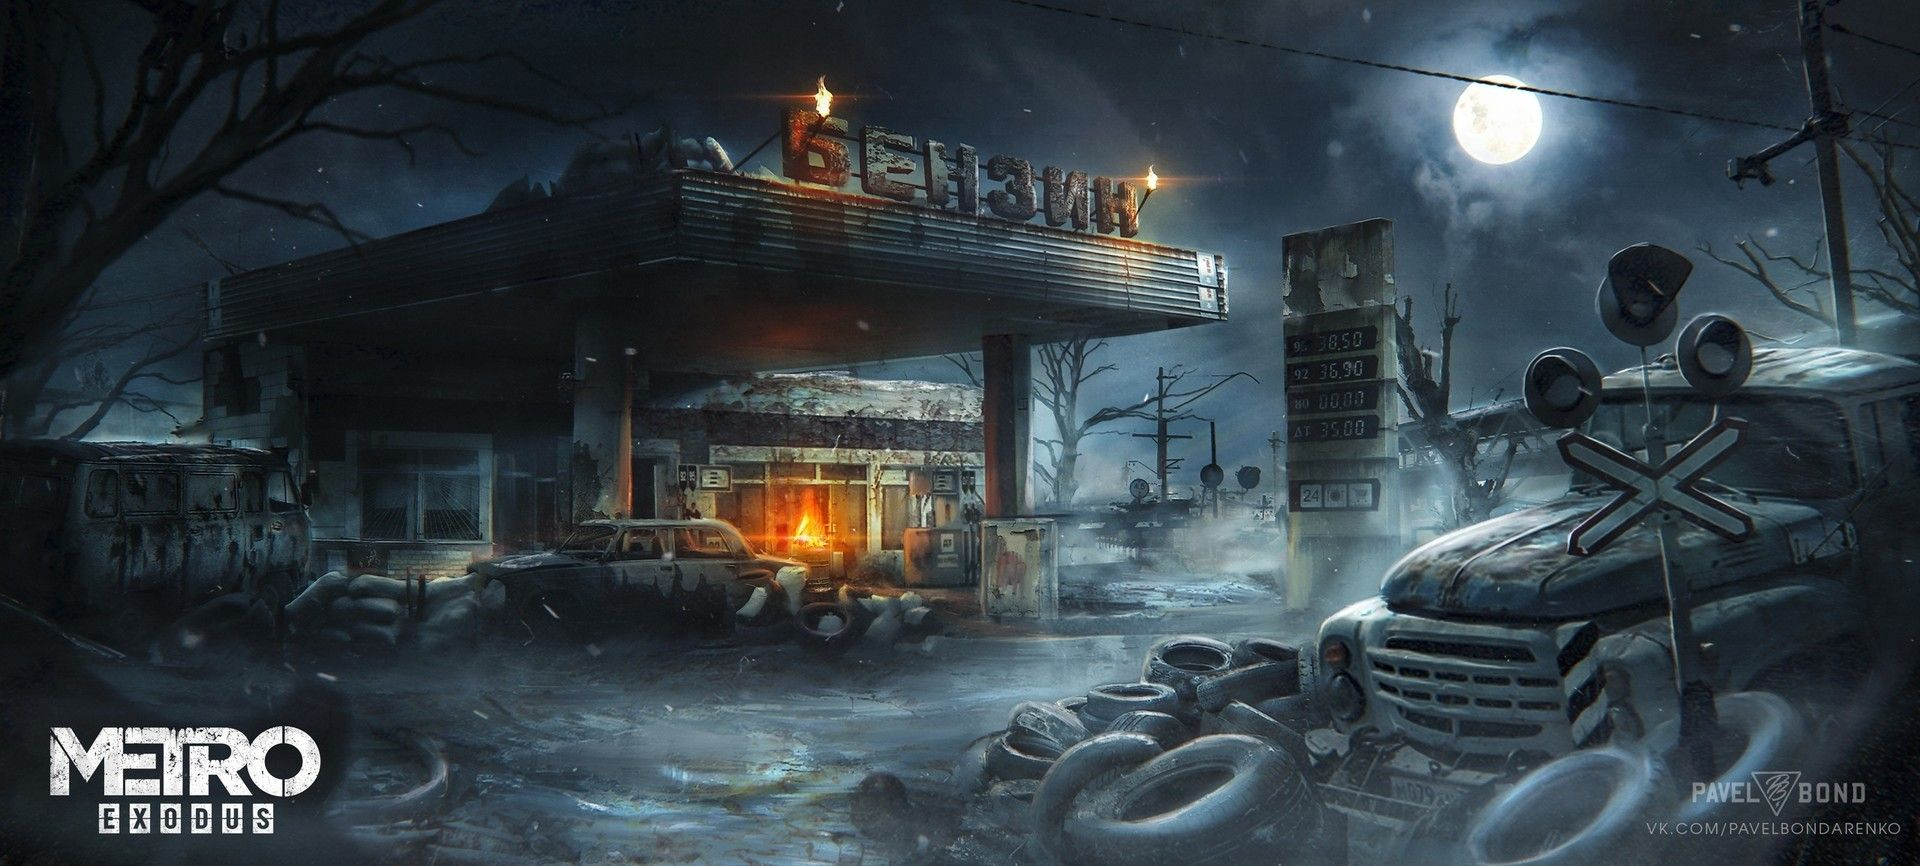 Metro Exodus 4k Wallpaper In 2020 Post Apocalyptic City Hd Wallpaper Exodus